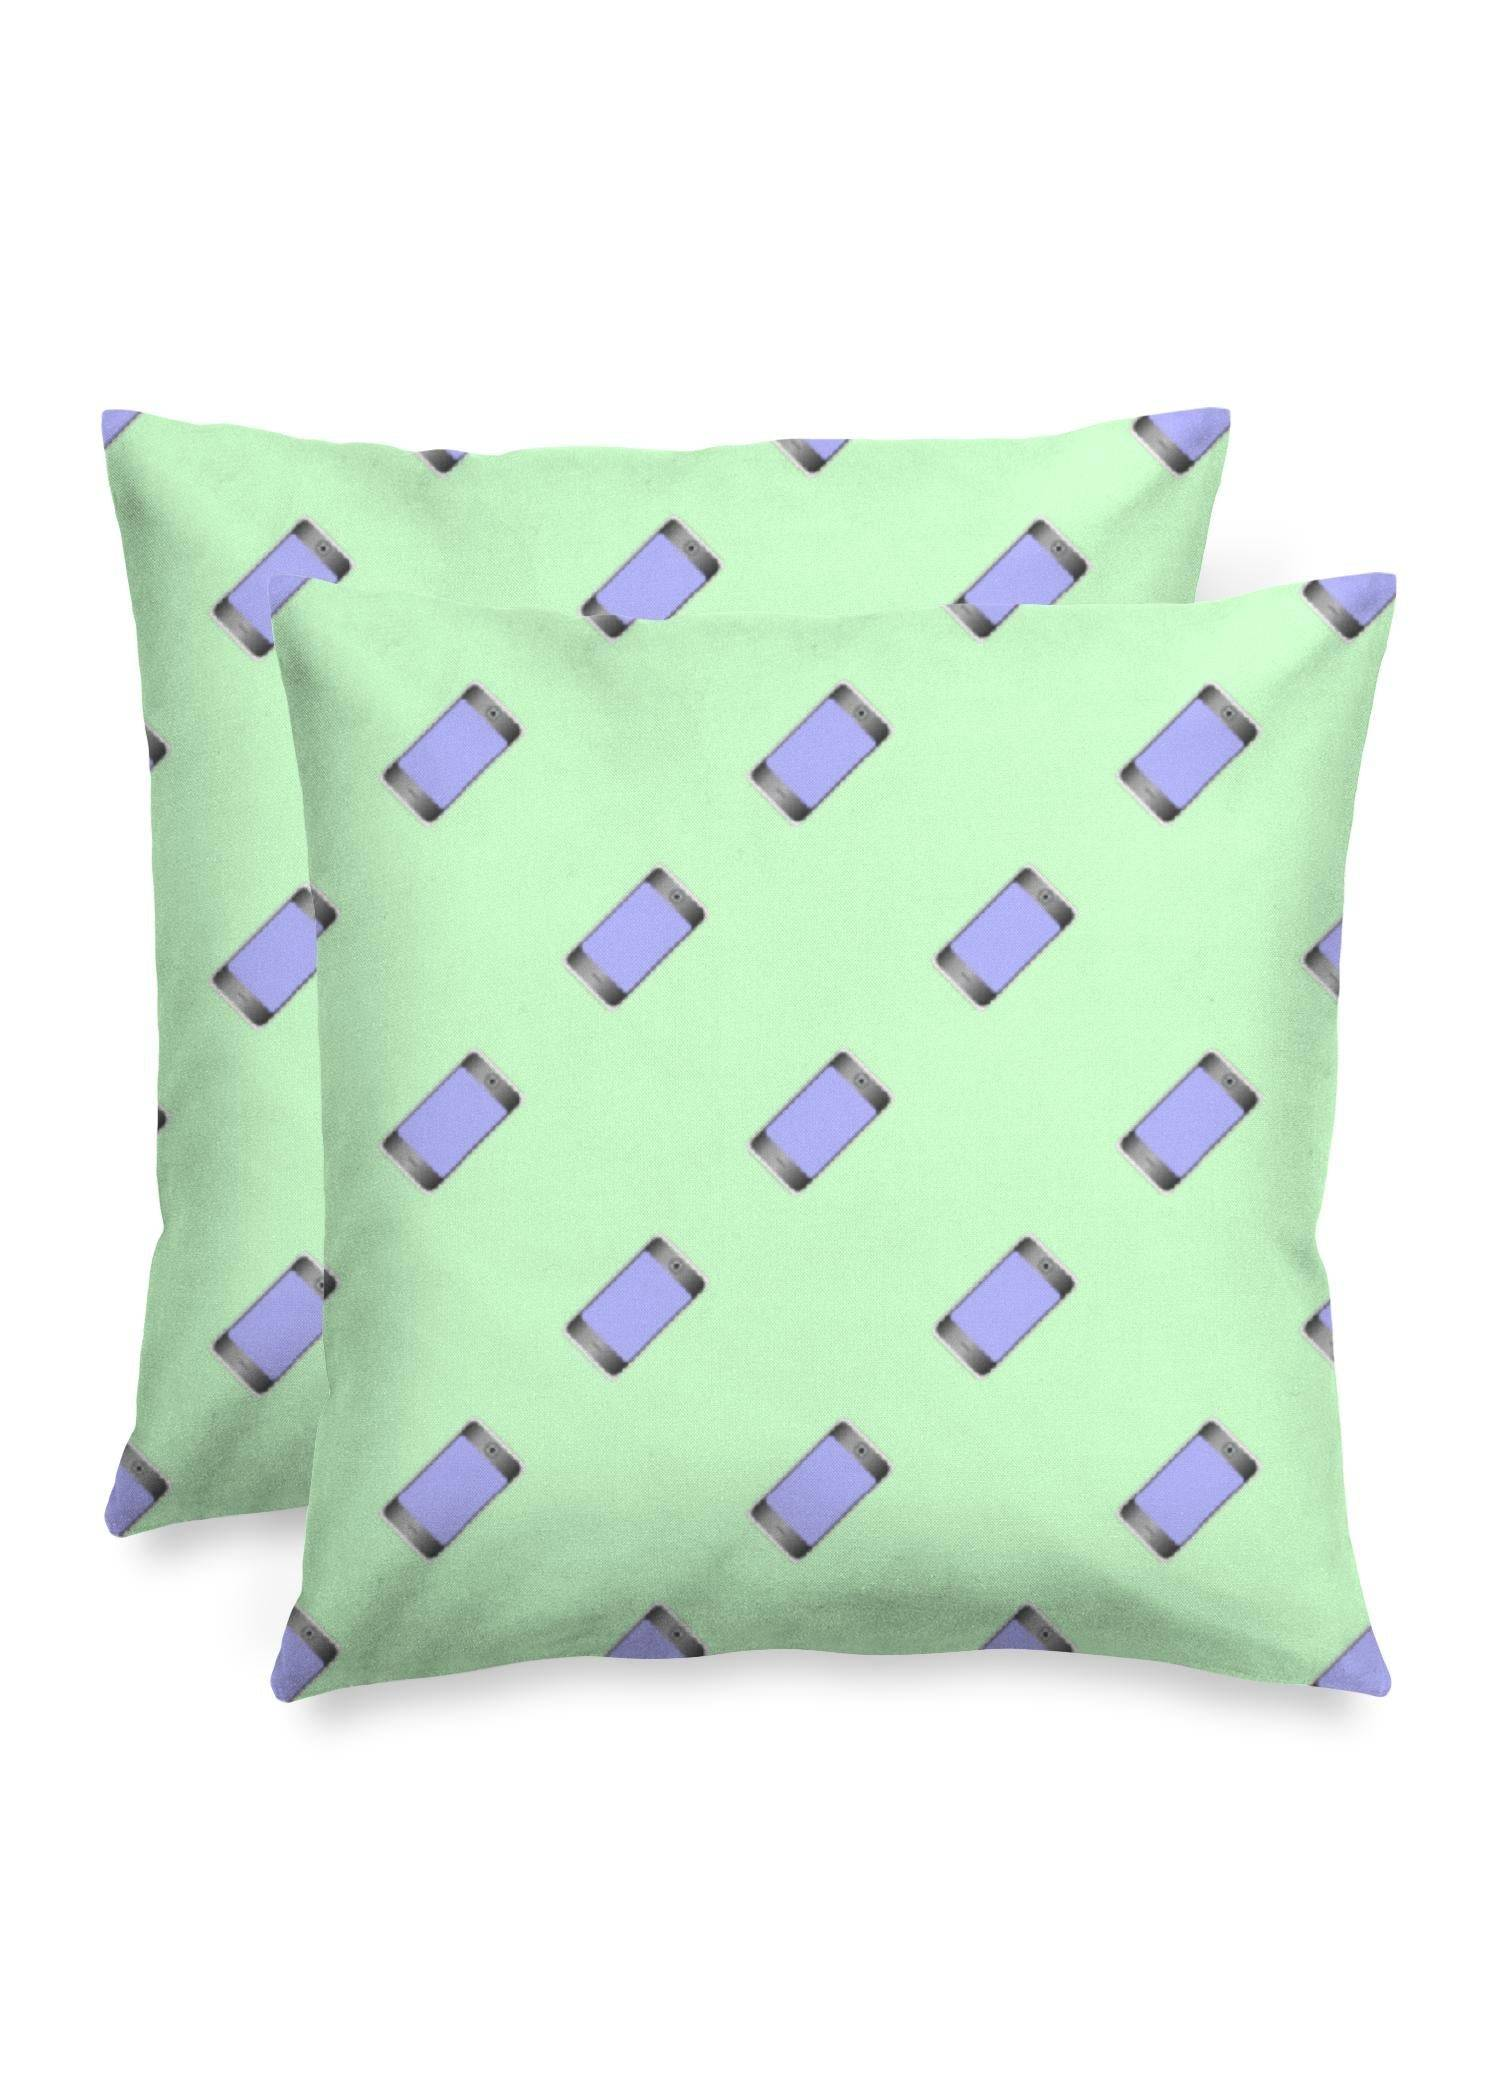 "VIDA Square Pillow - Mobile Phones On Green in Green by VIDA Original Artist  - Size: Luster / 16"" / Set"